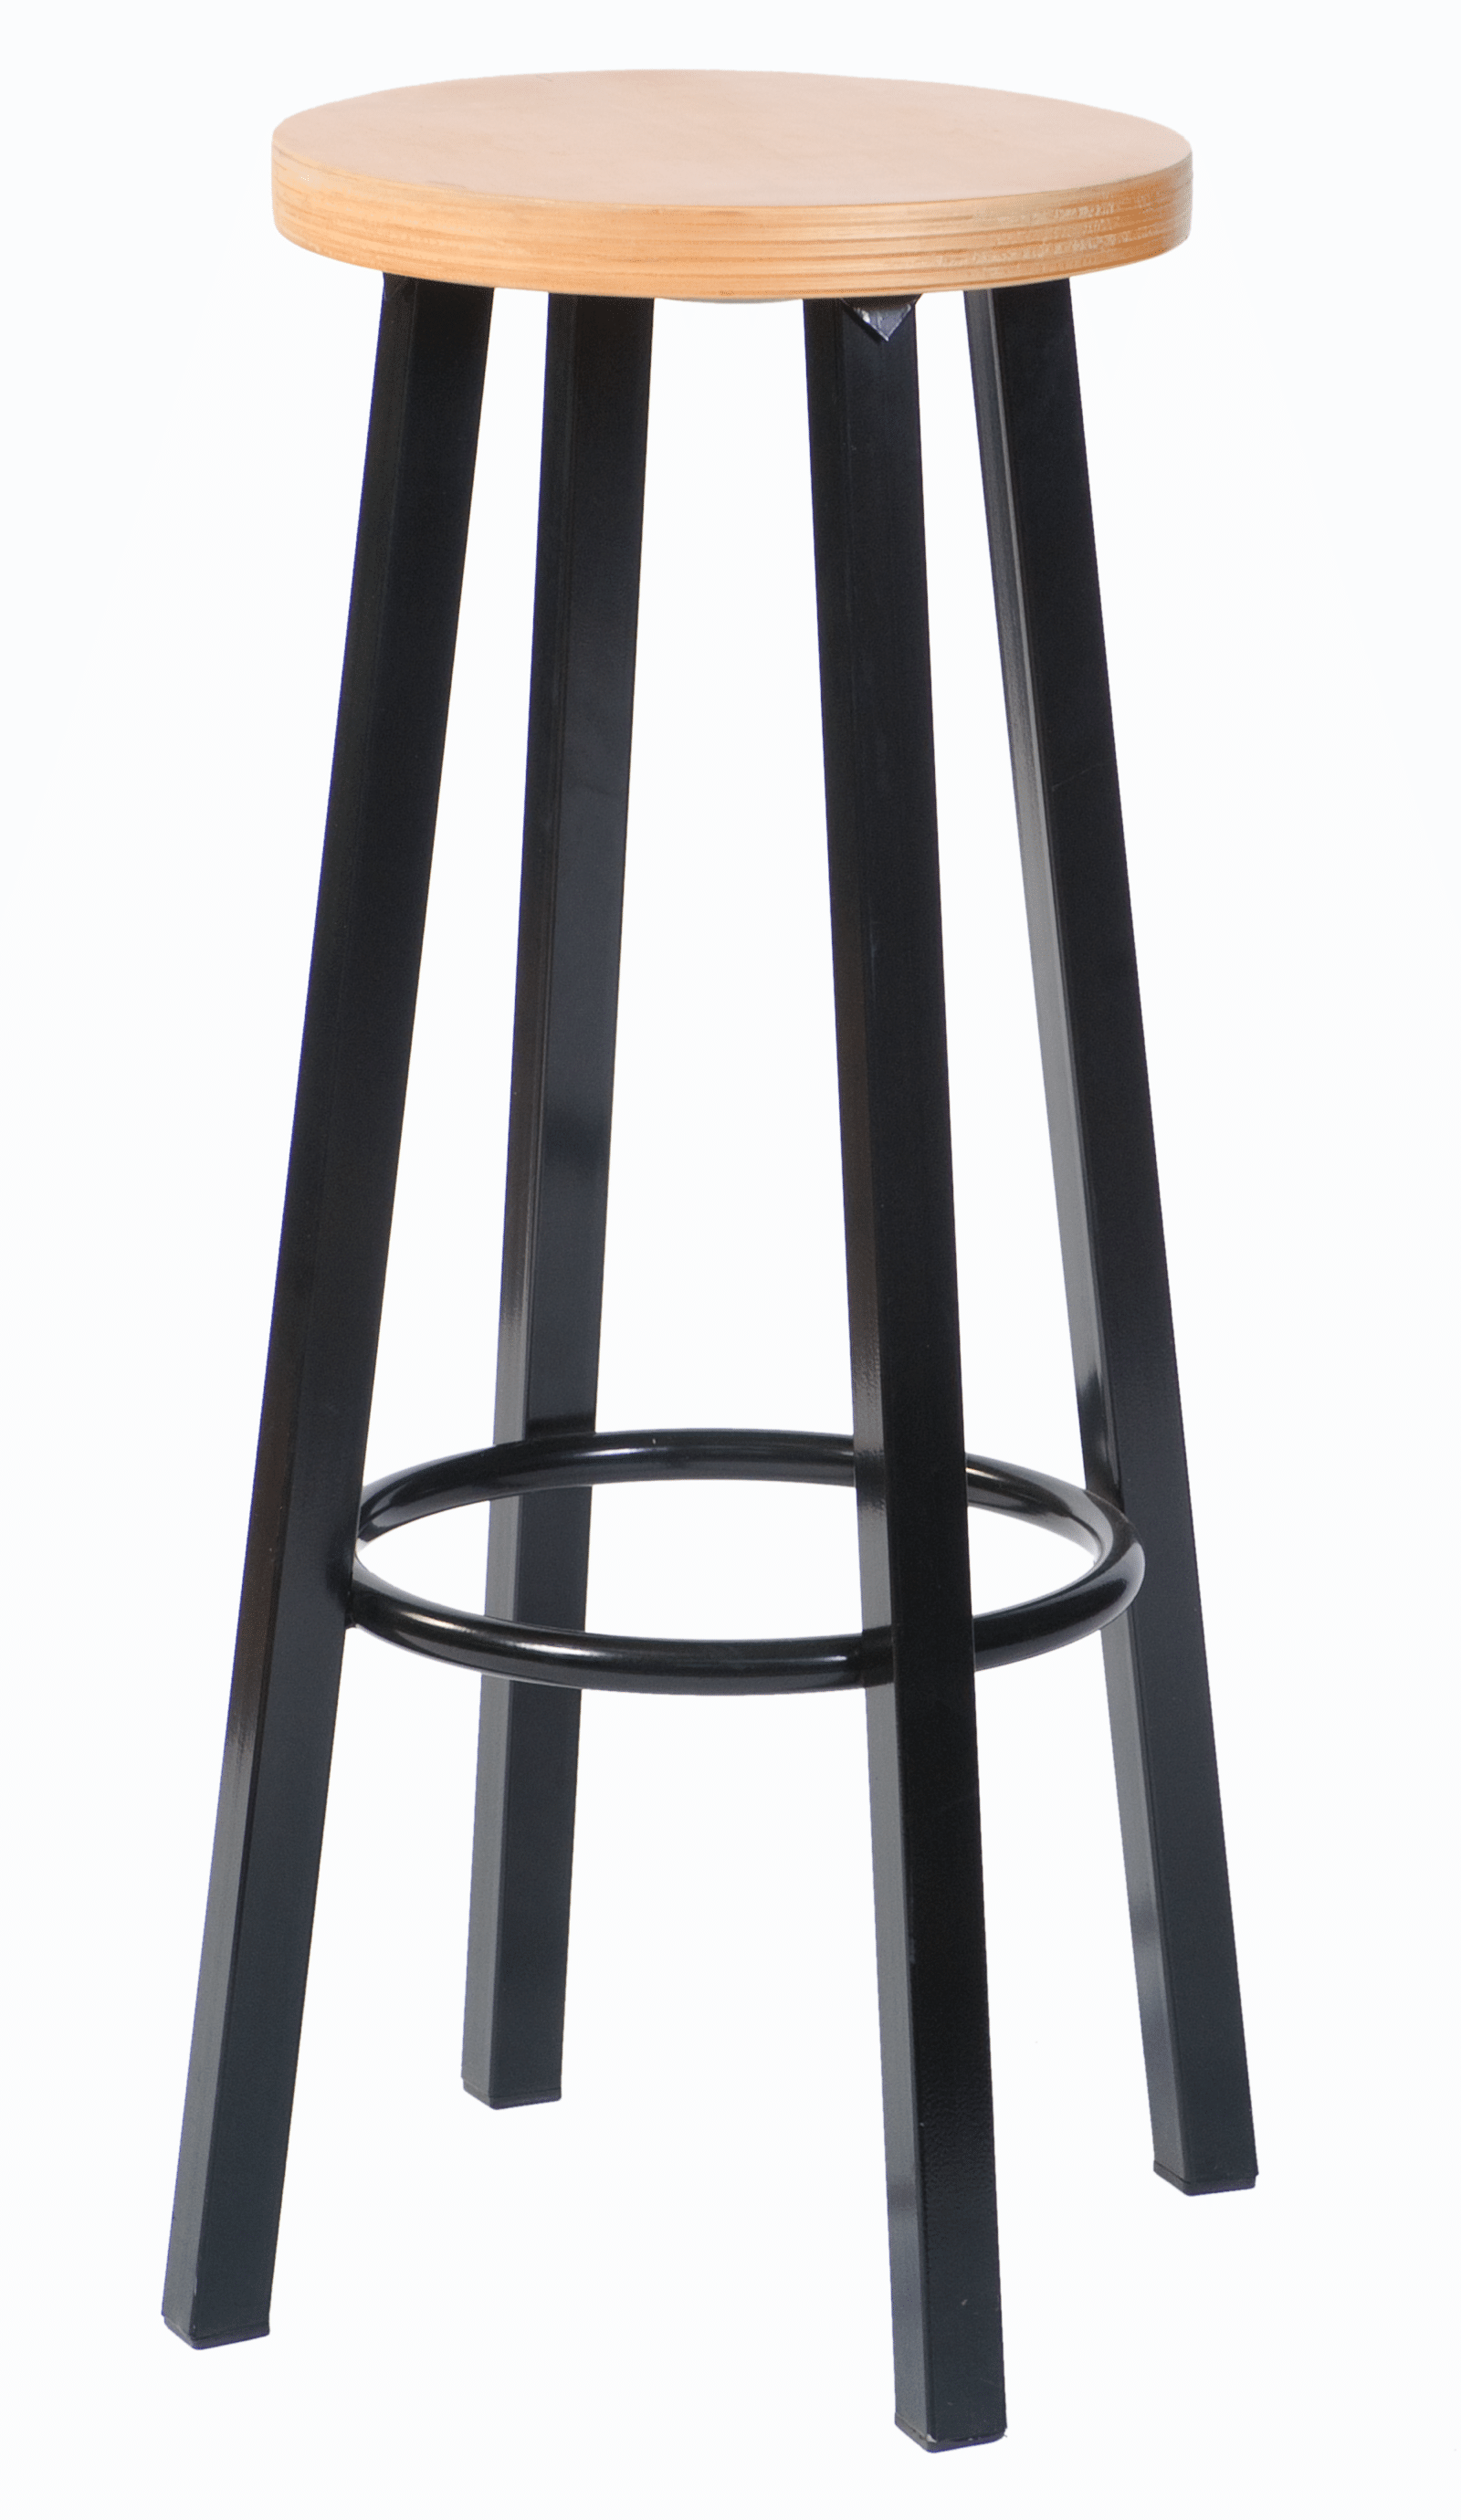 204 Blank Beuken 1 - Barkruk 204H Zwart